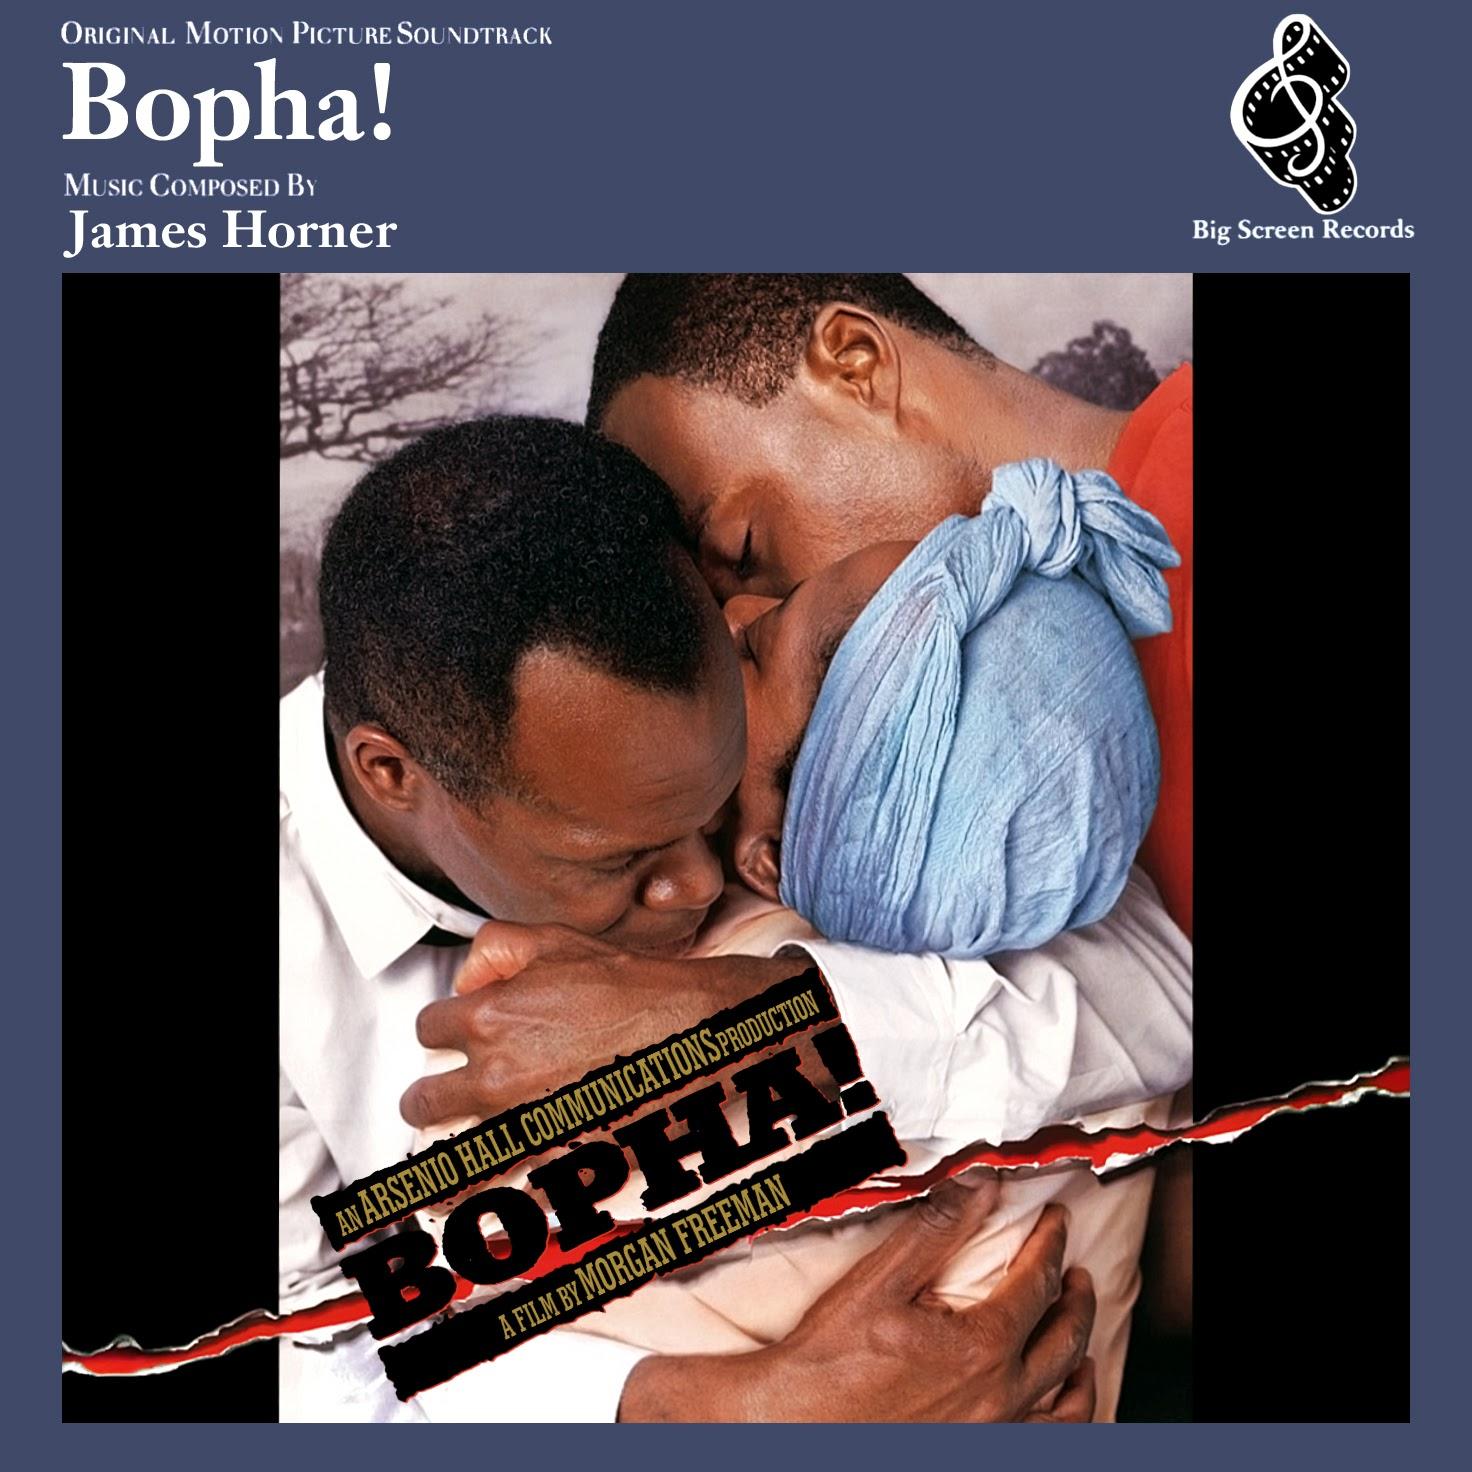 Album Artist: James Horner / Album Title: Bopha! (Original Motion Picture Soundtrack)